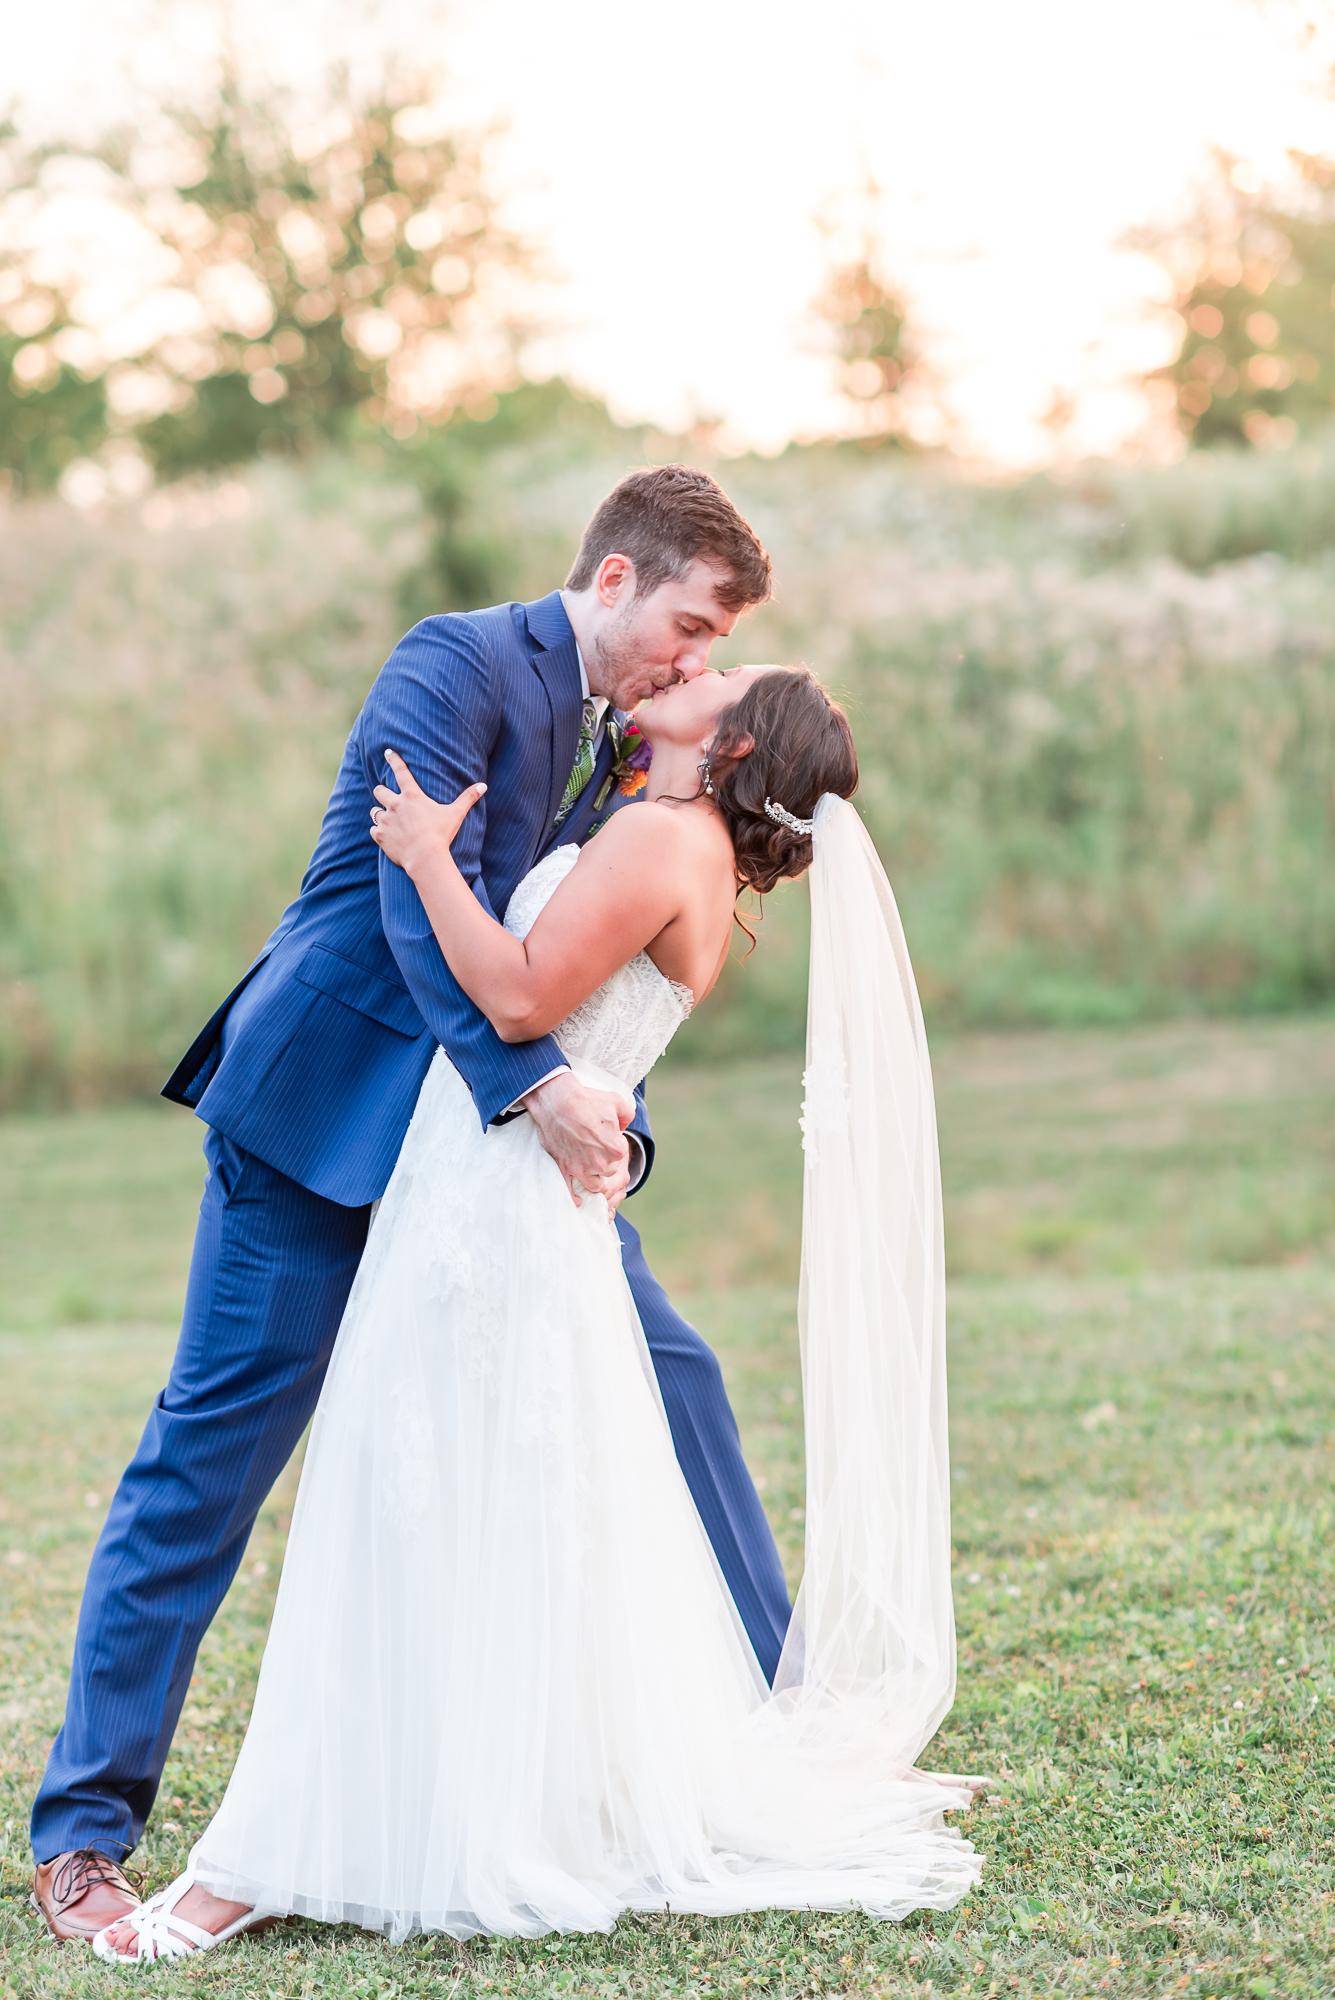 Maria+Adam_Summer Barn Wedding_The Barn and The North Star Preserve_Oberlin_Ohio-155.jpg